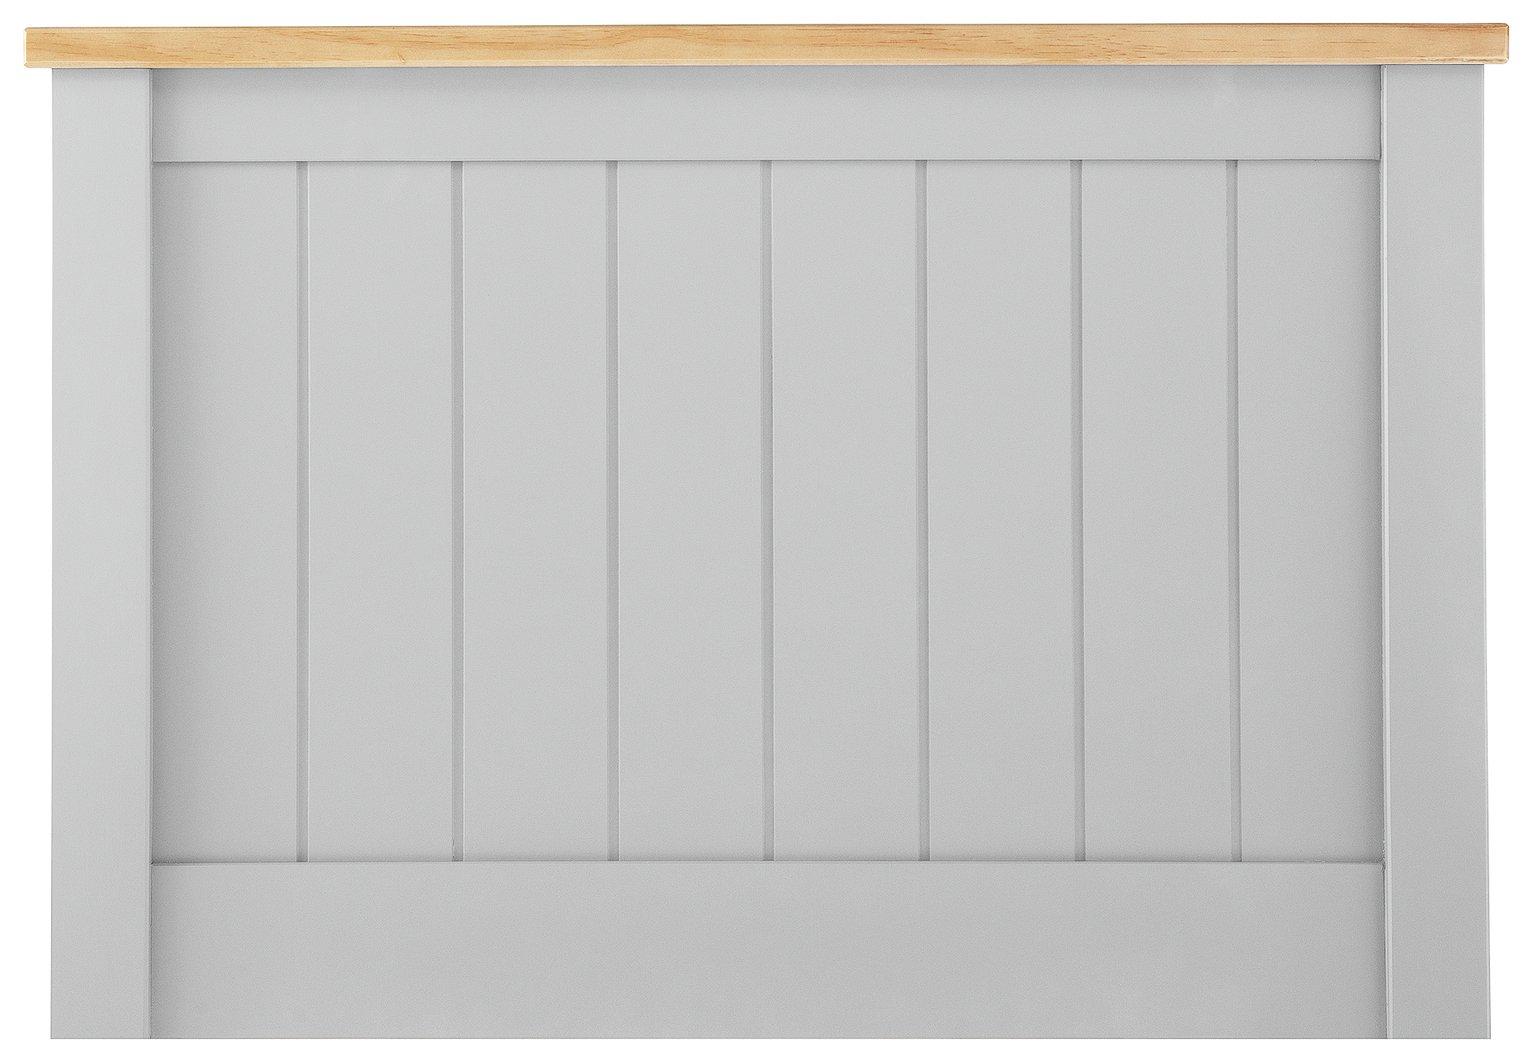 Argos Home Grafton Single Headboard - Two Tone Grey